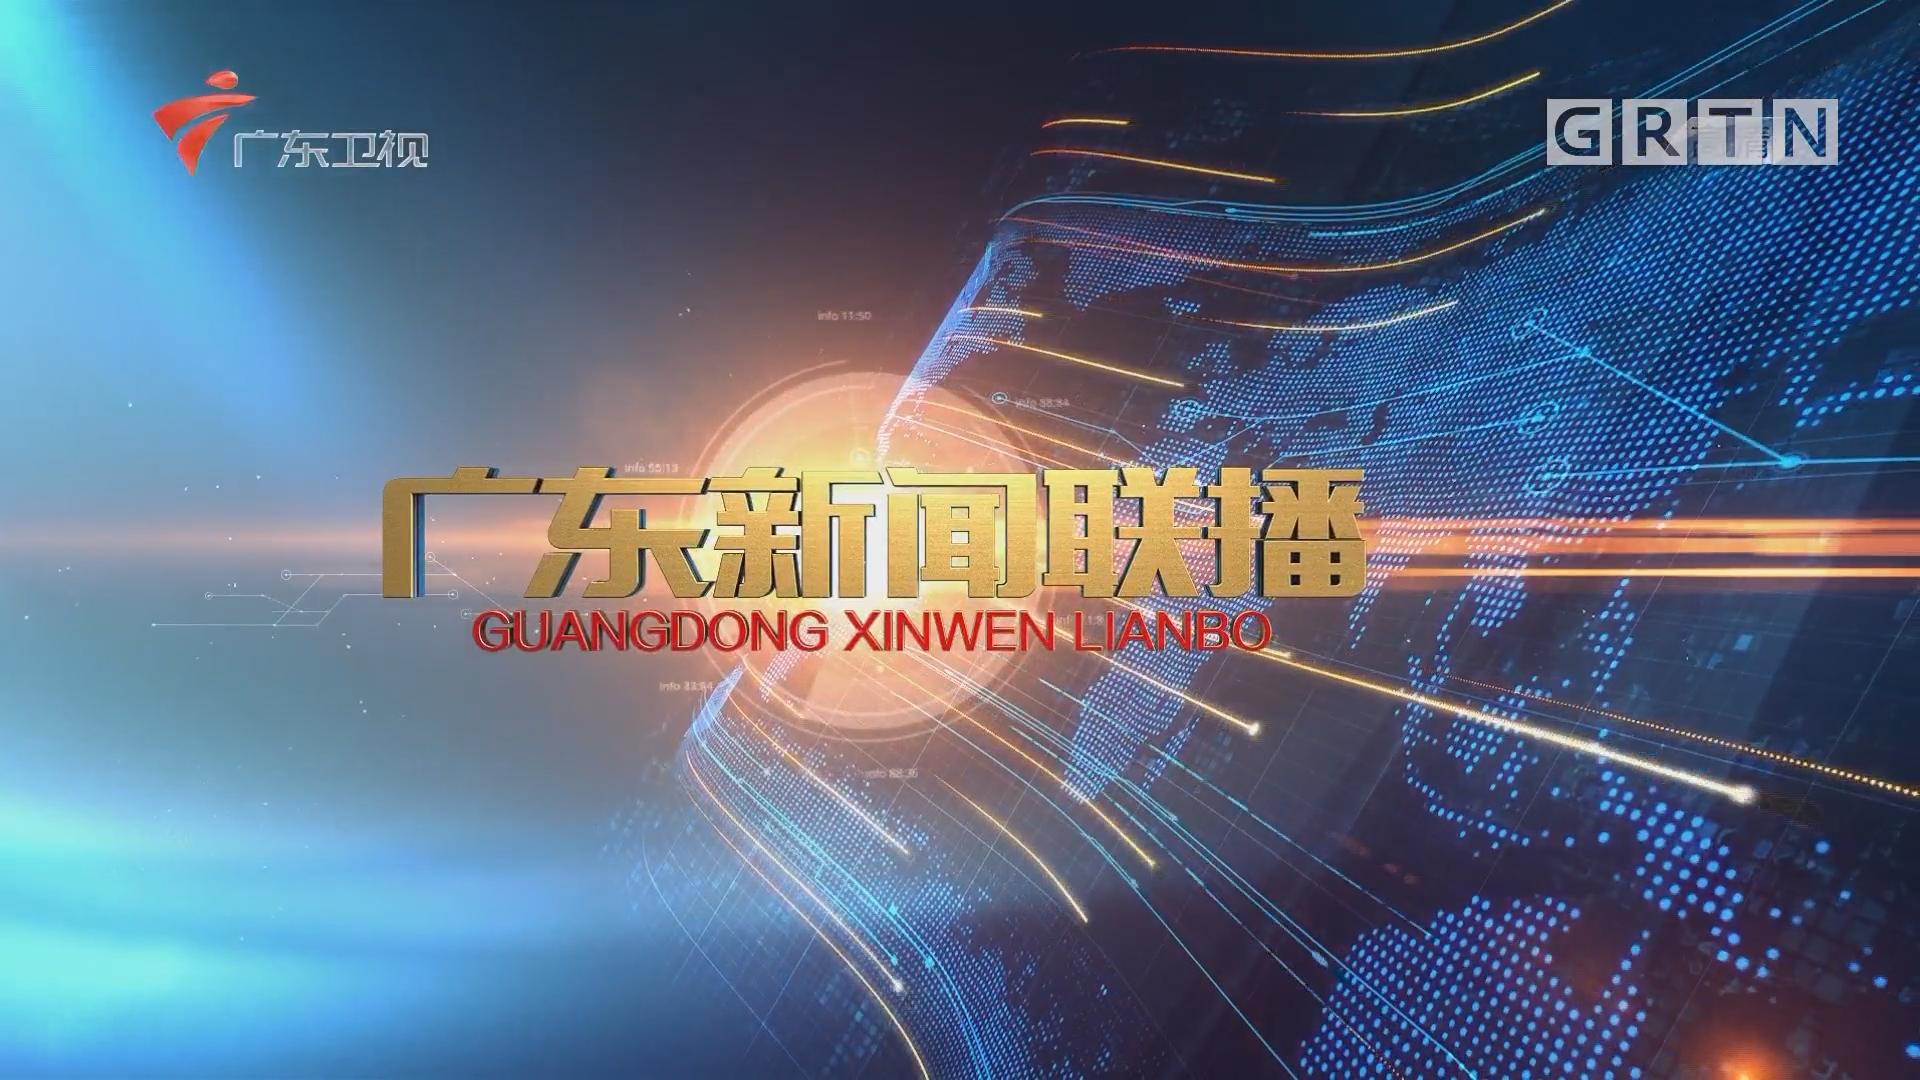 [HD][2018-07-16]广东新闻联播:2018年上半年广东省十件民生实事成效显著